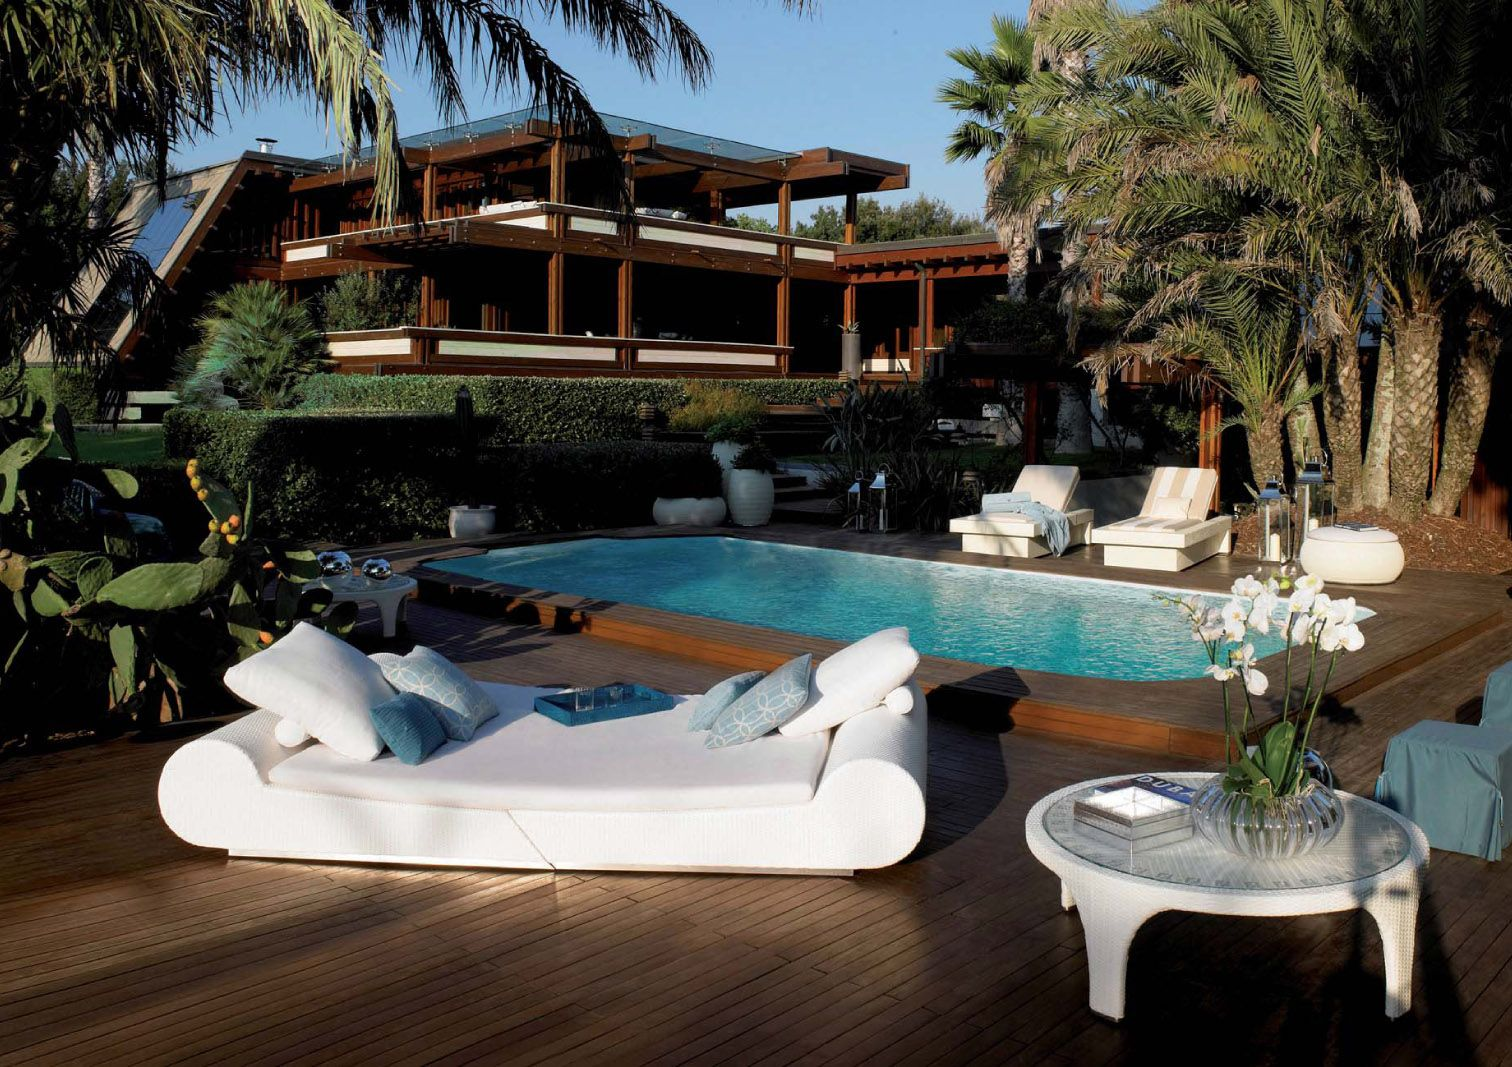 Fendi outdoor furniture | Best modern house design, Outdoor ...